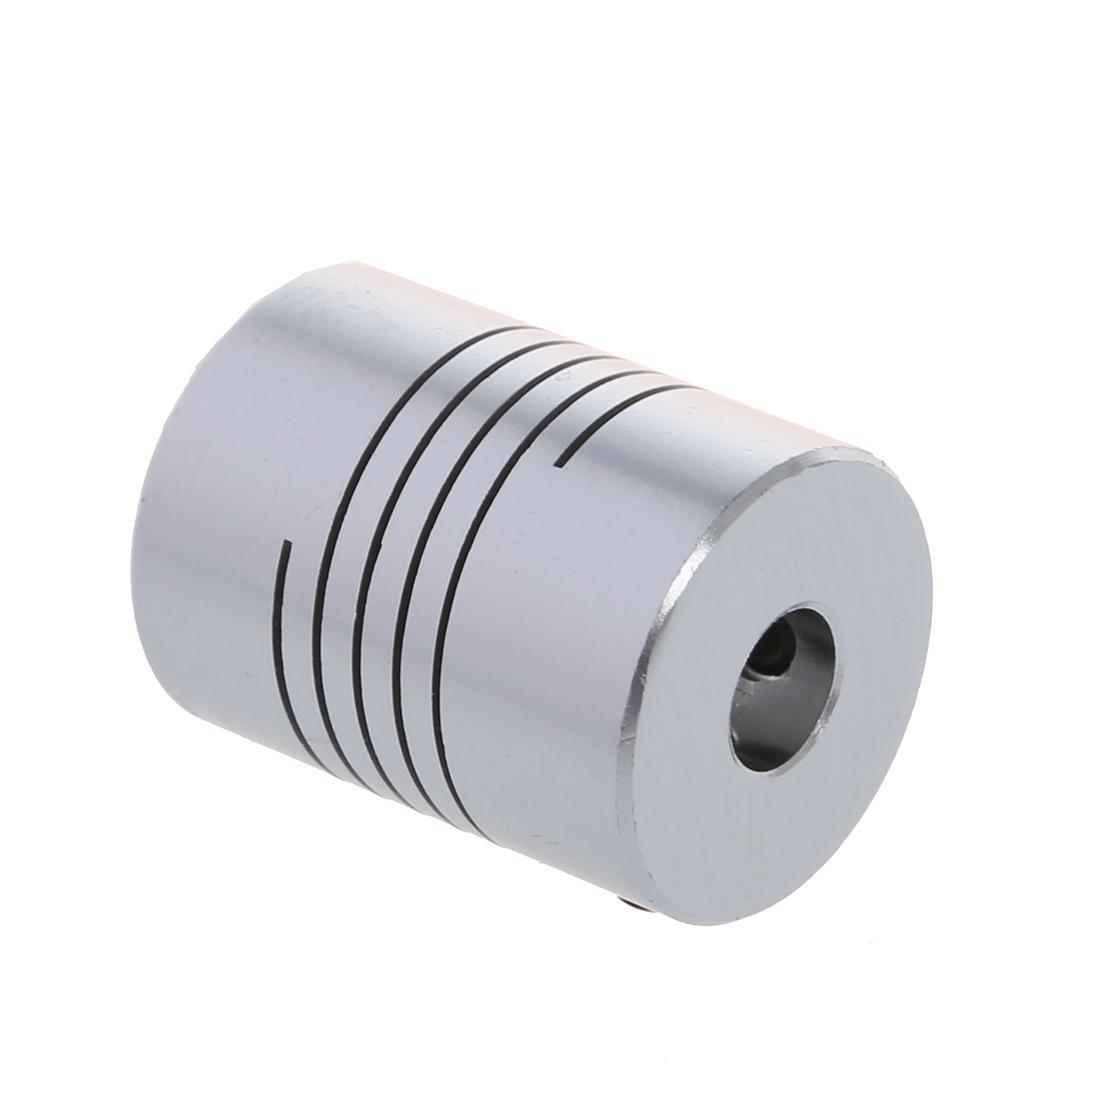 B3 stepper motor flexible shaft coupling coupler for Stepper motor shaft coupling coupler